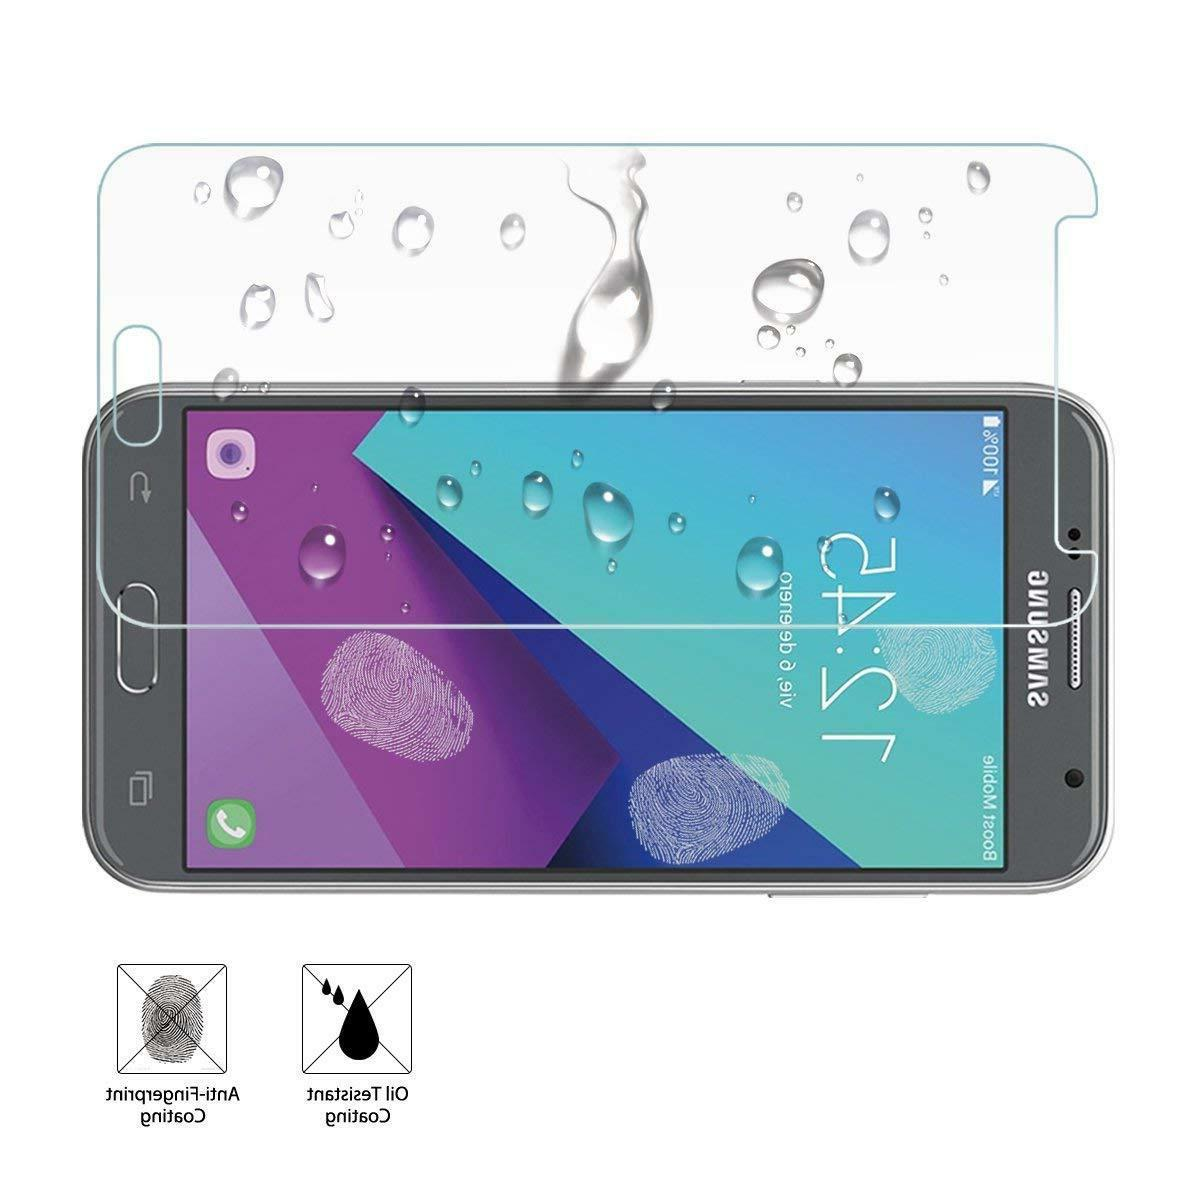 For Samsung Galaxy Emerge/J3 Prime/Luna Phone Protector